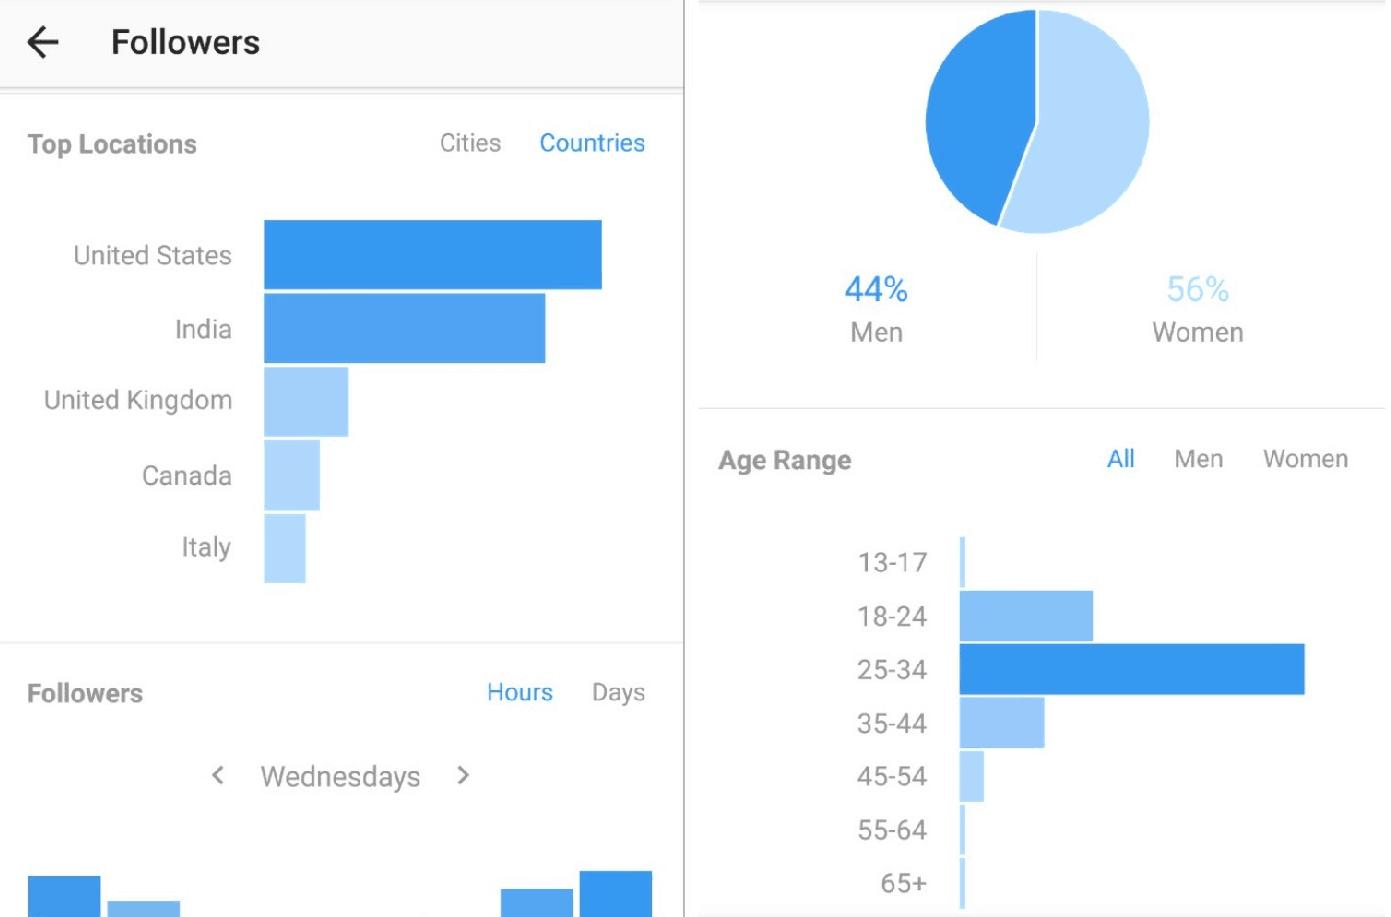 Demographics - How to become an instagram influencer